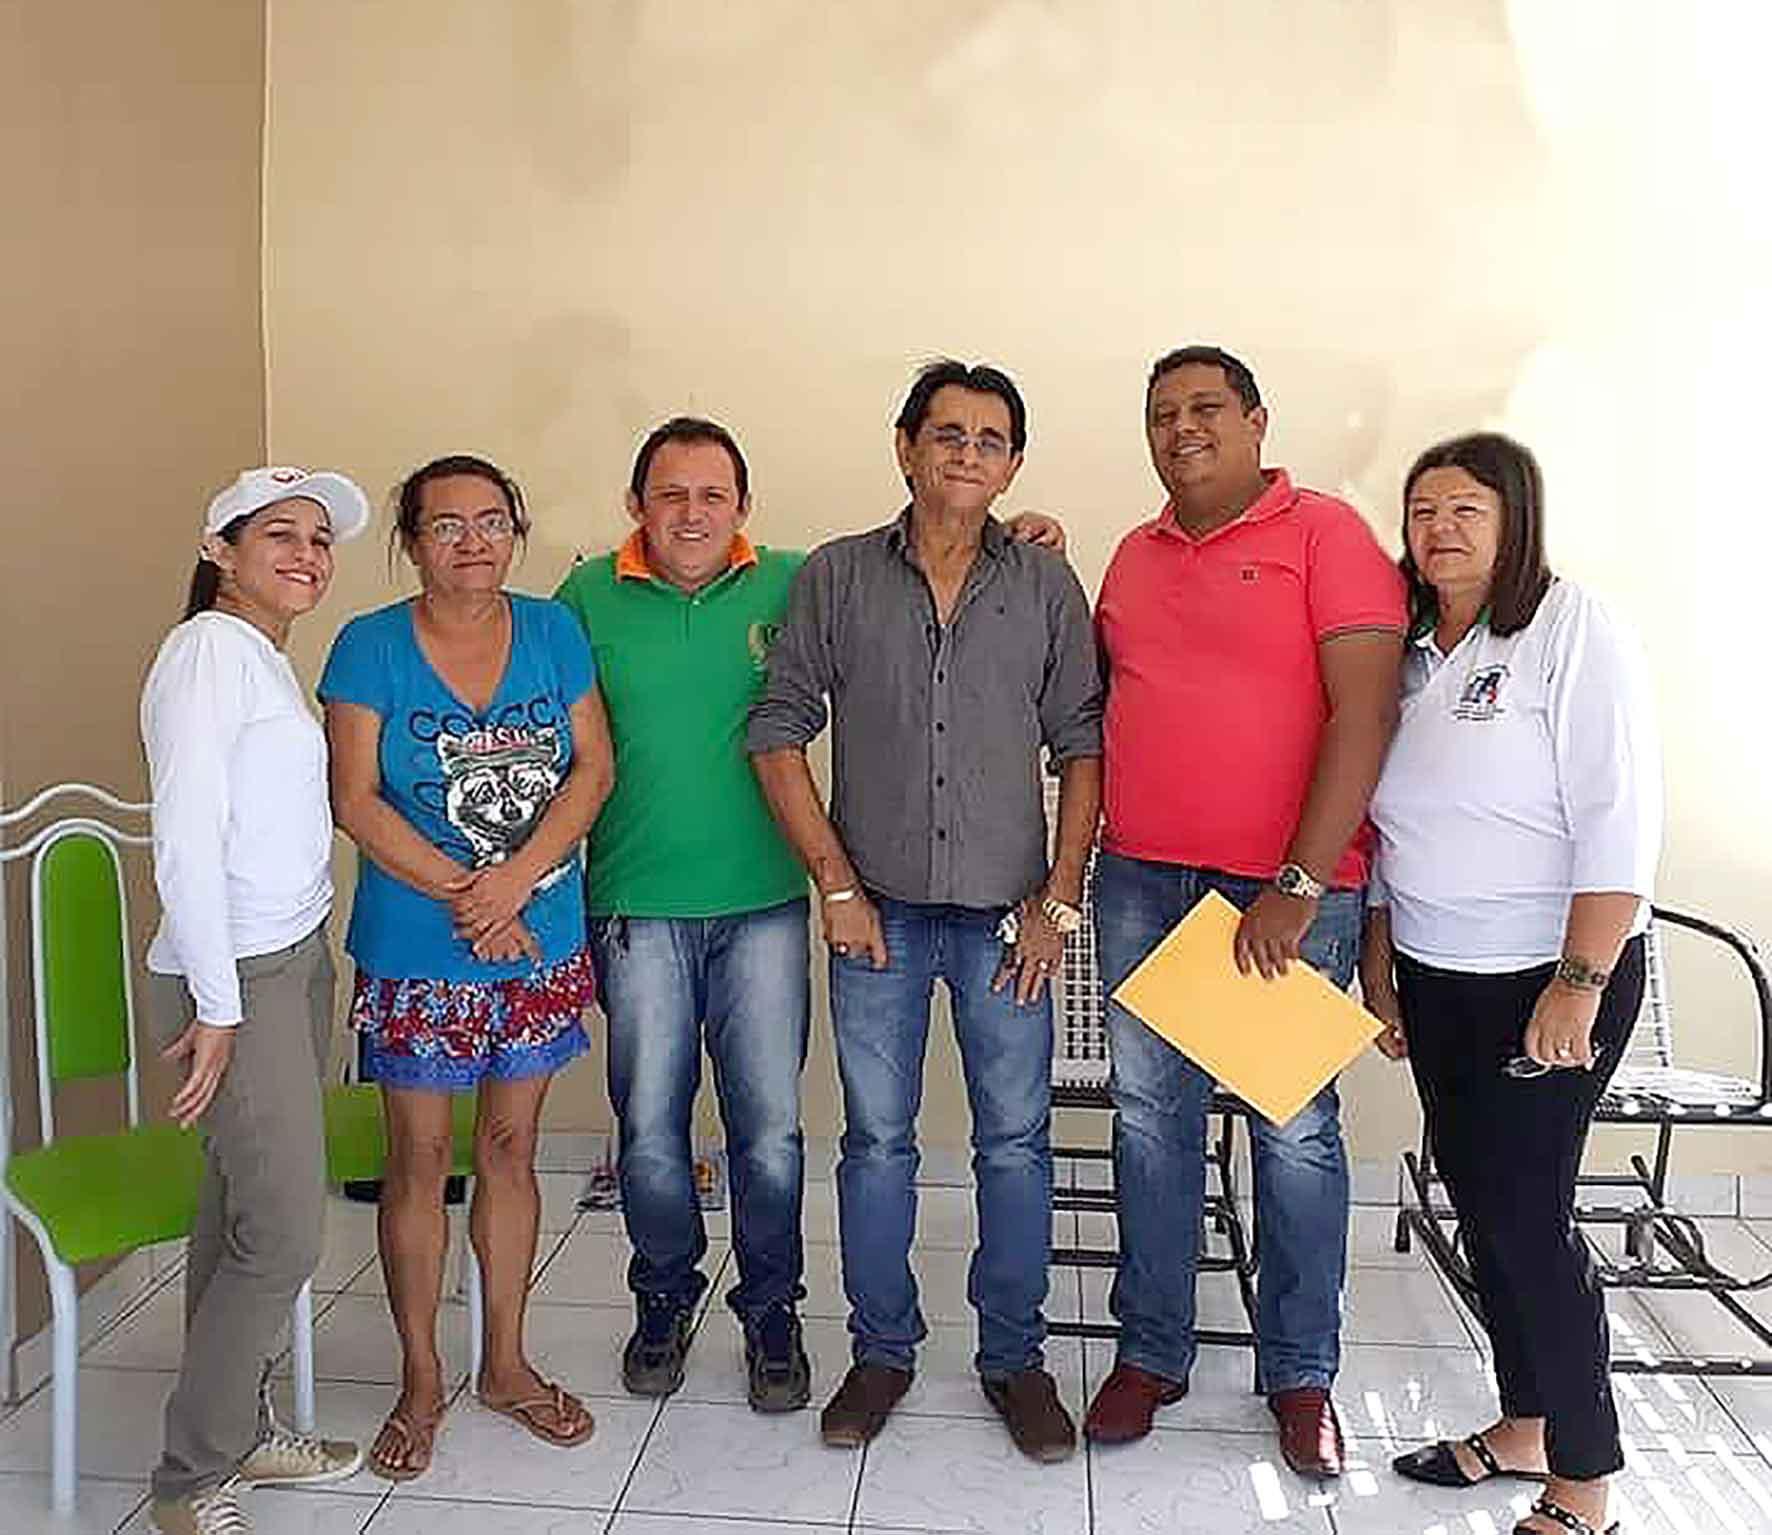 Prefeito de Mato Grosso dialoga com representantes de Sindicato dos Agentes de Saúde e Endemias